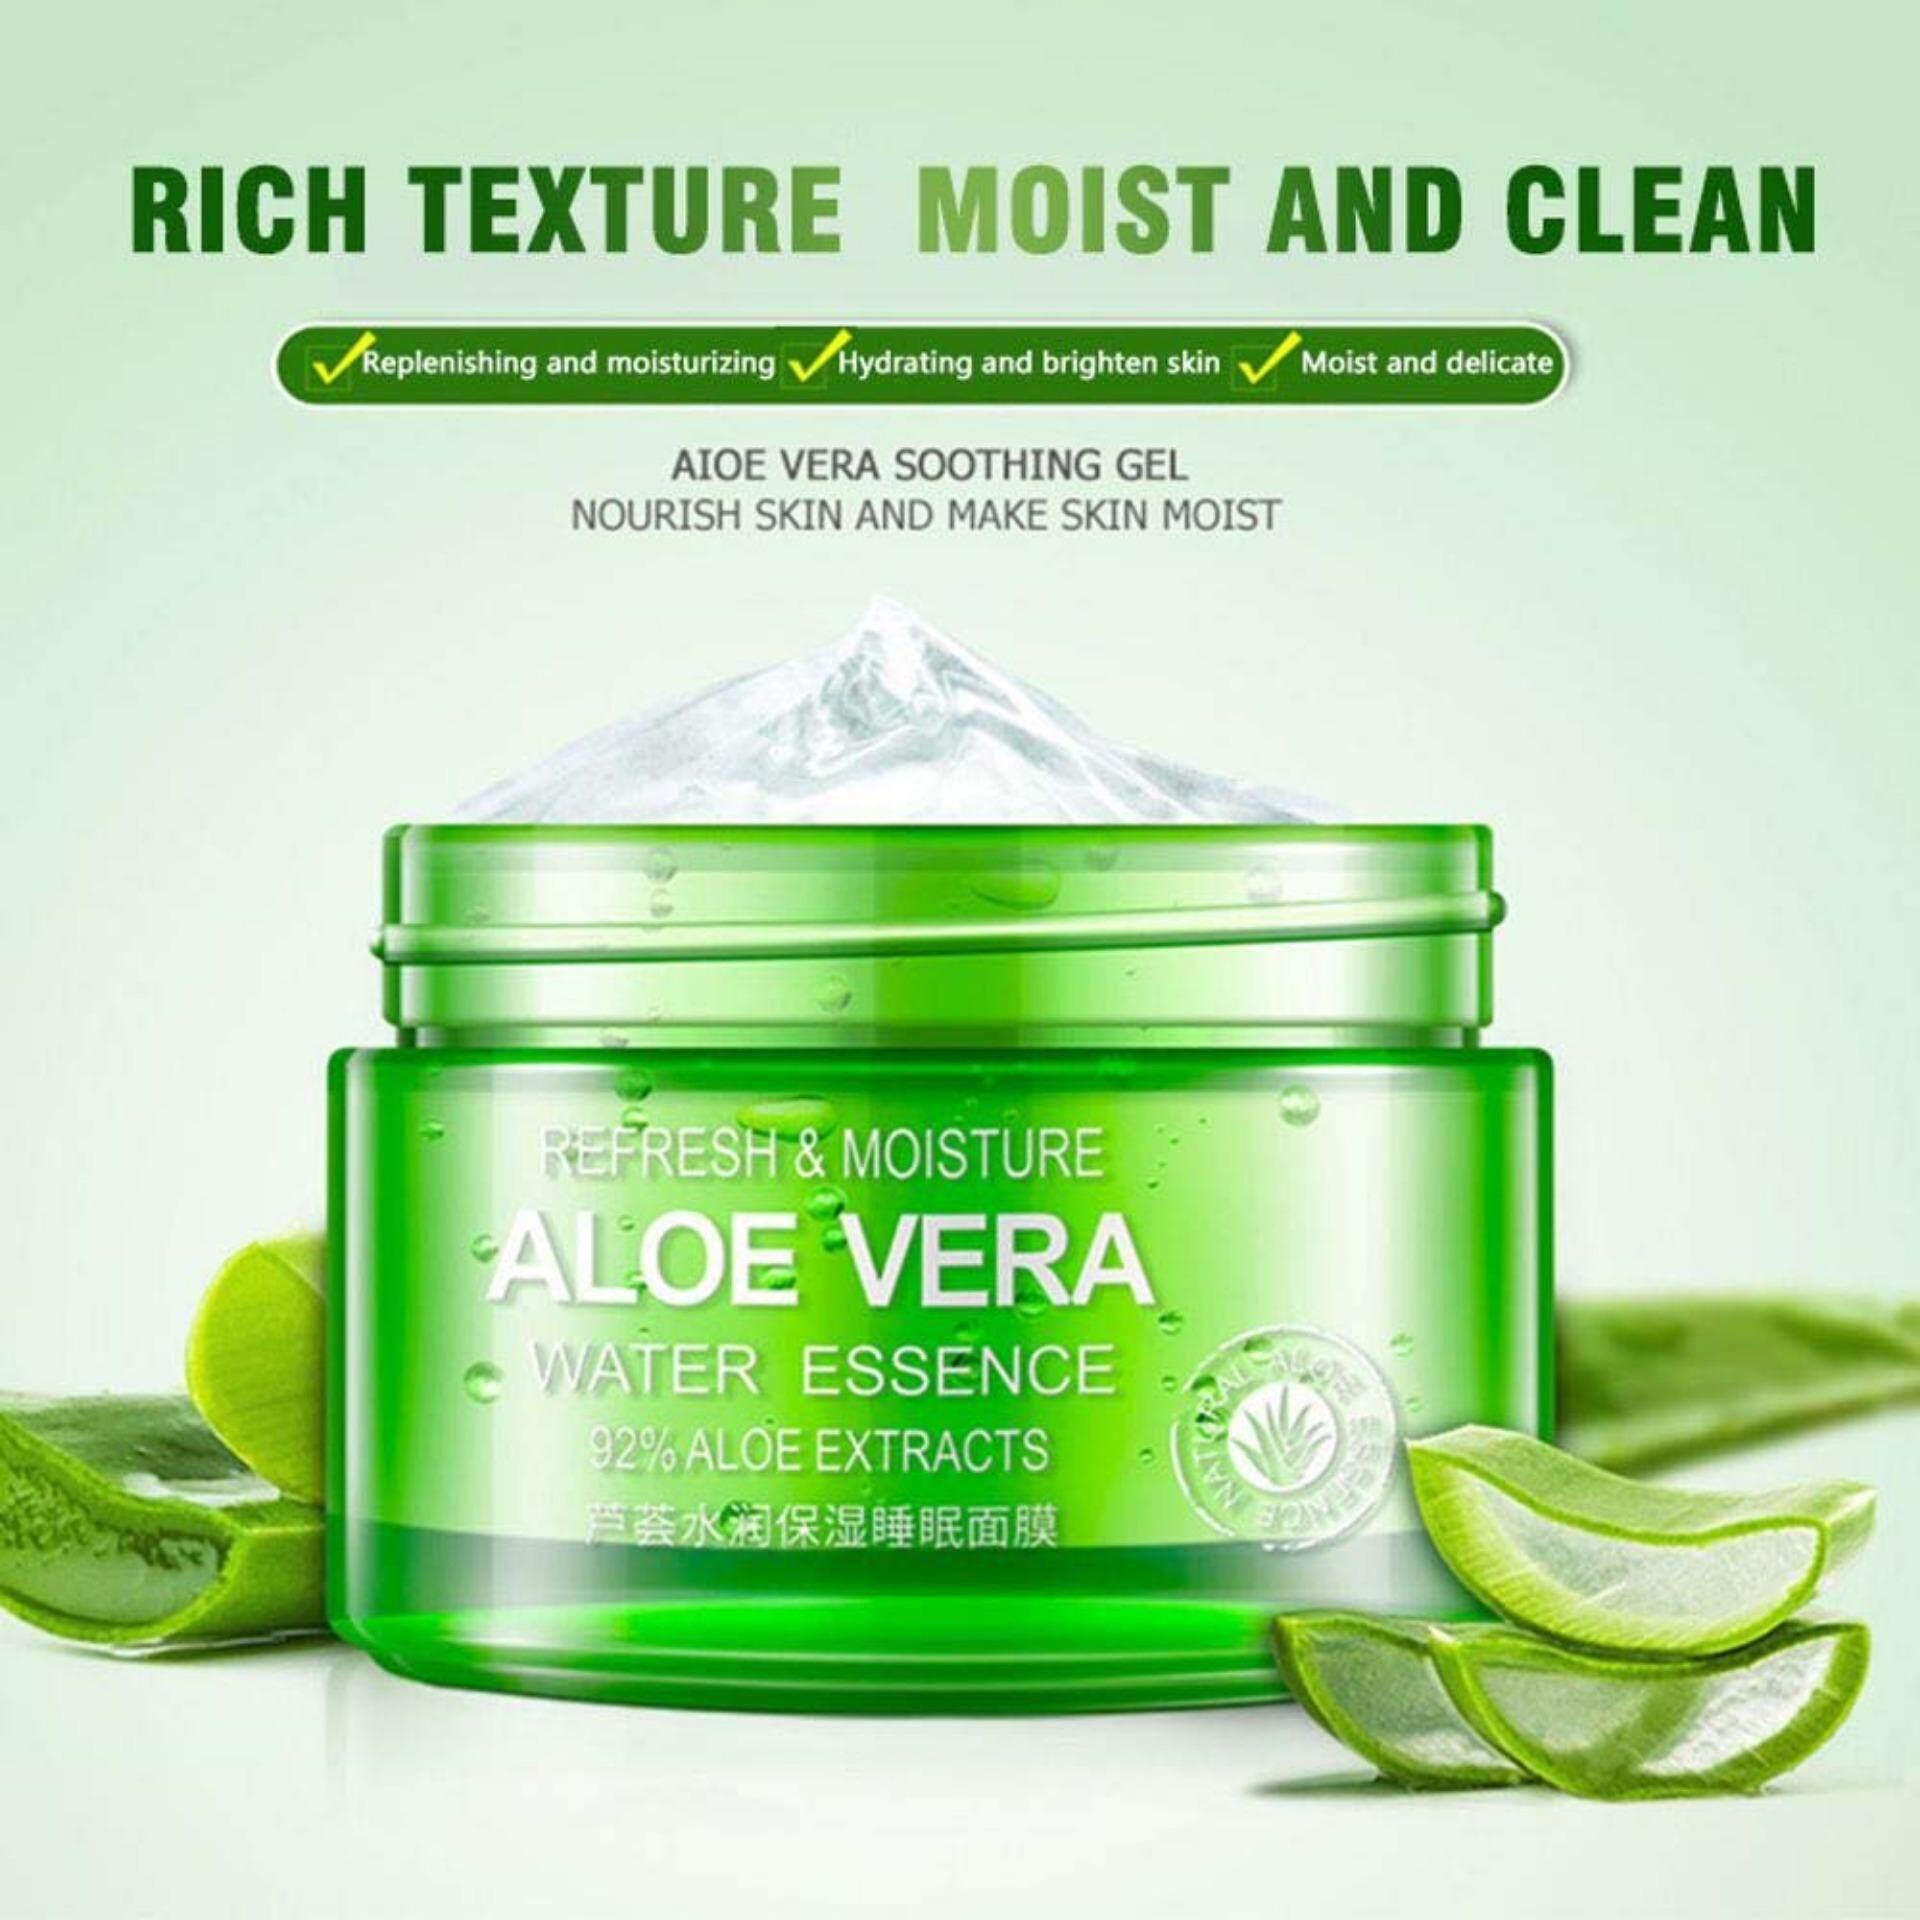 Fitur Bioaqua 92 Aloe Vera Water Essence 100g Bqy6186 Dan Harga Soothing Gel 160ml 2